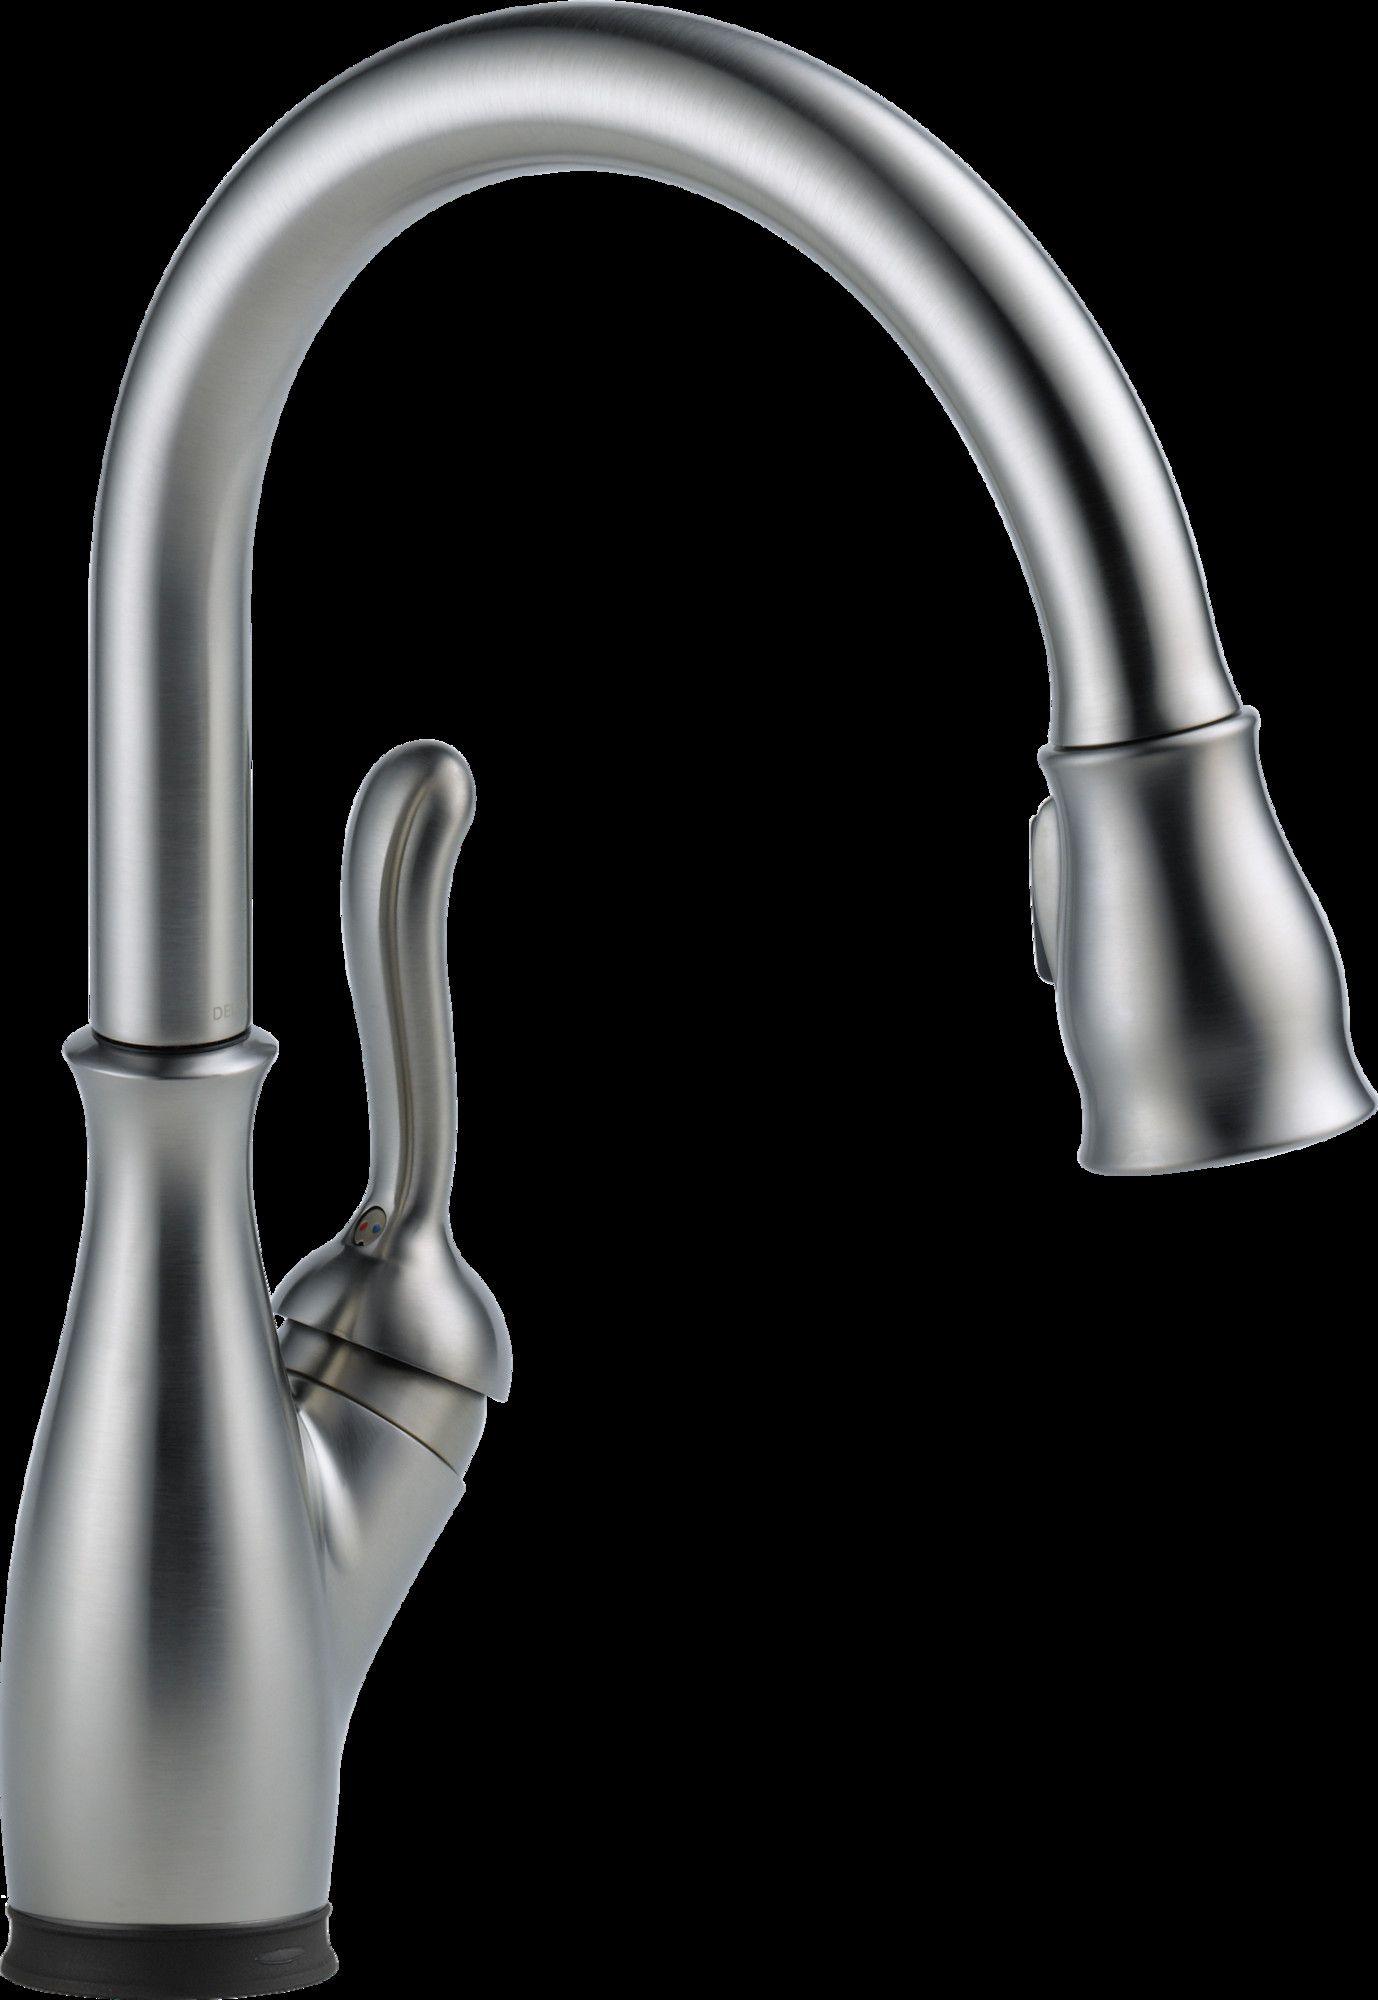 Leland Single Handle Standard Kitchen Faucet   Products   Pinterest ...